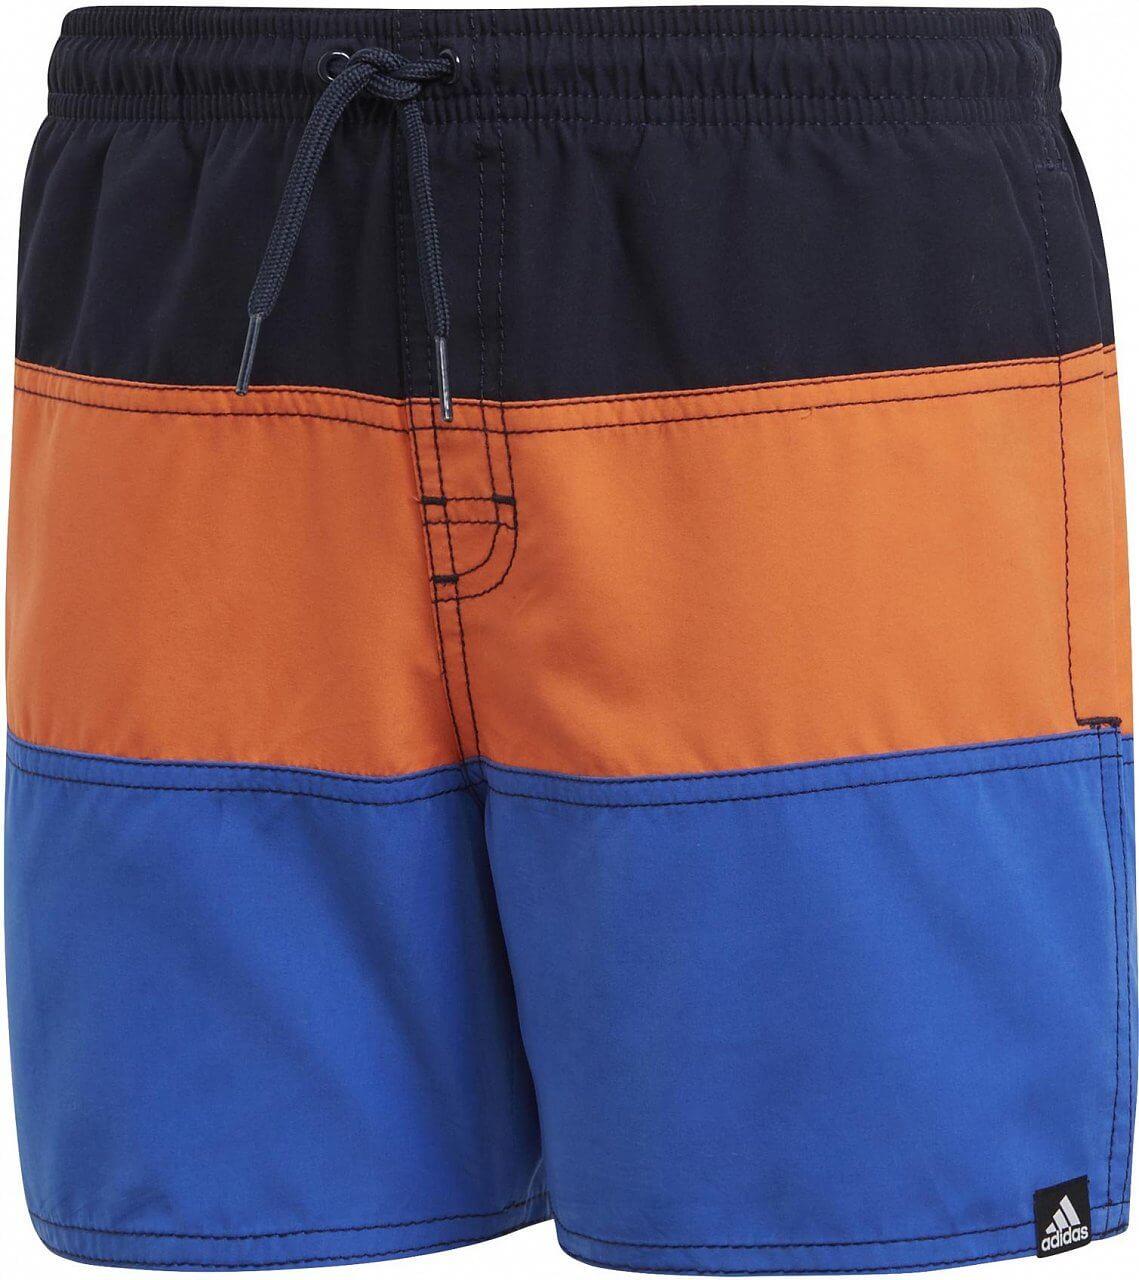 Chlapecké plavky adidas Youth Boys Colorblock Swim Shorts Short-Length